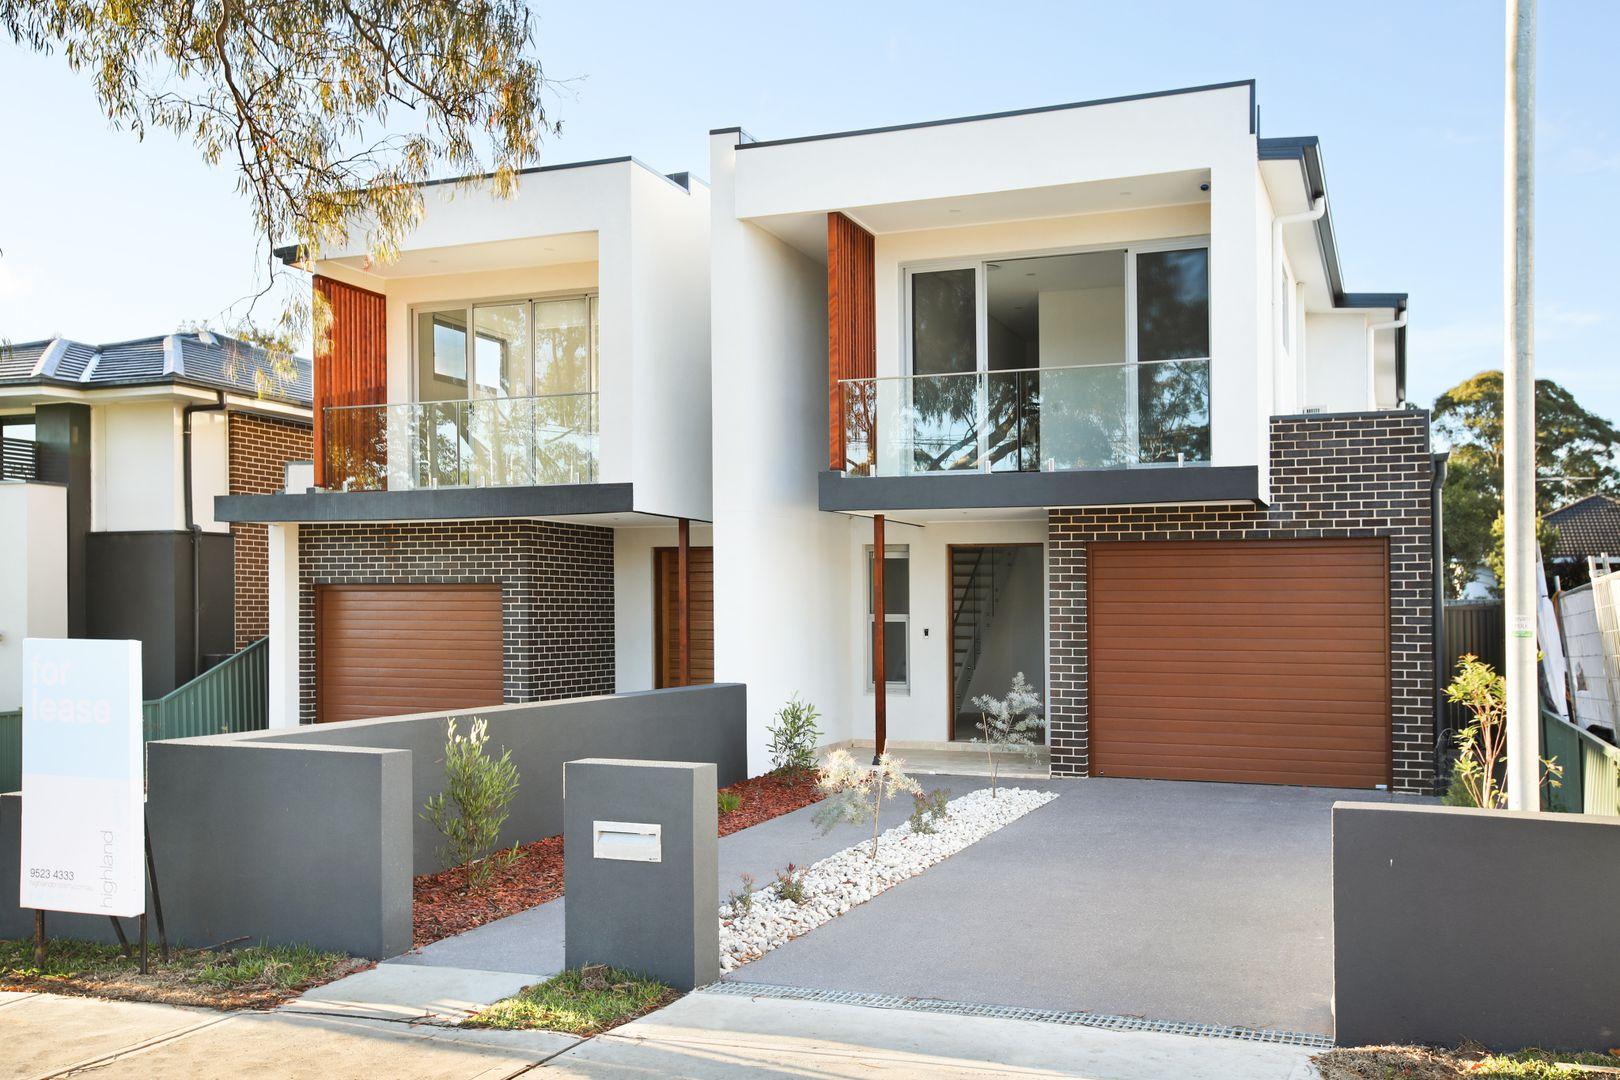 21a Jellicoe Street, Caringbah South NSW 2229, Image 0